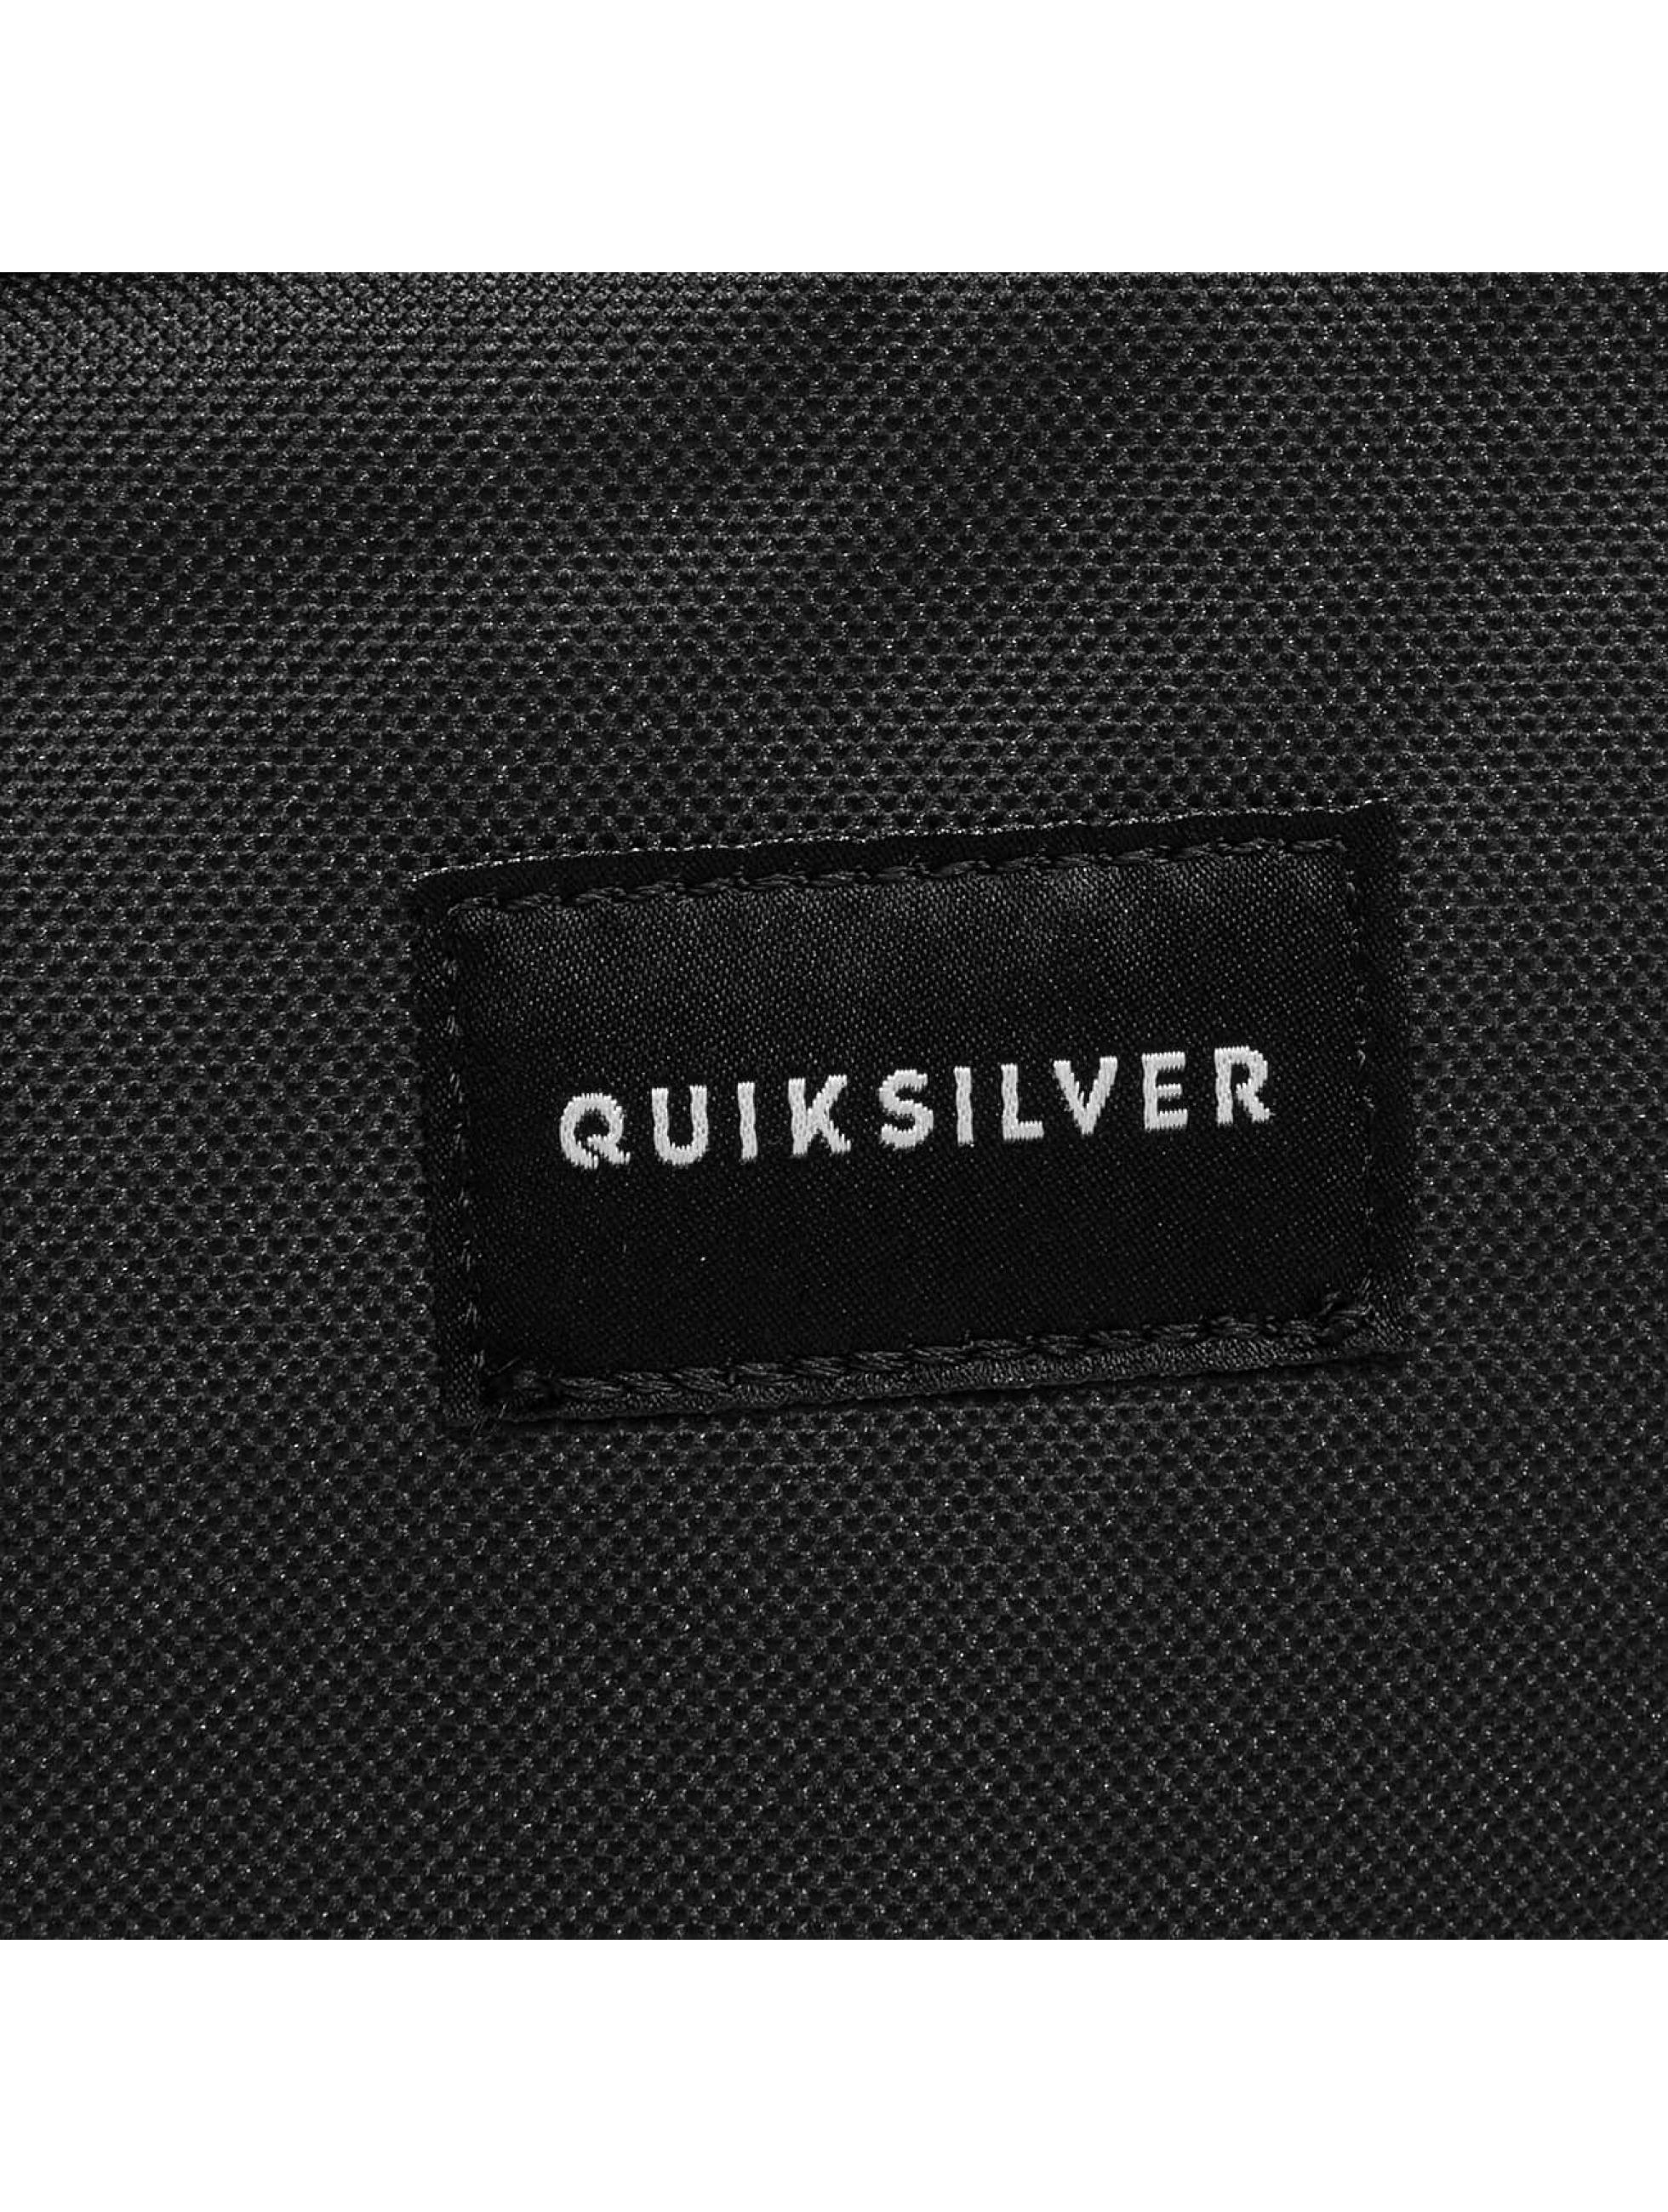 Quiksilver Rygsæk 1969 Special sort